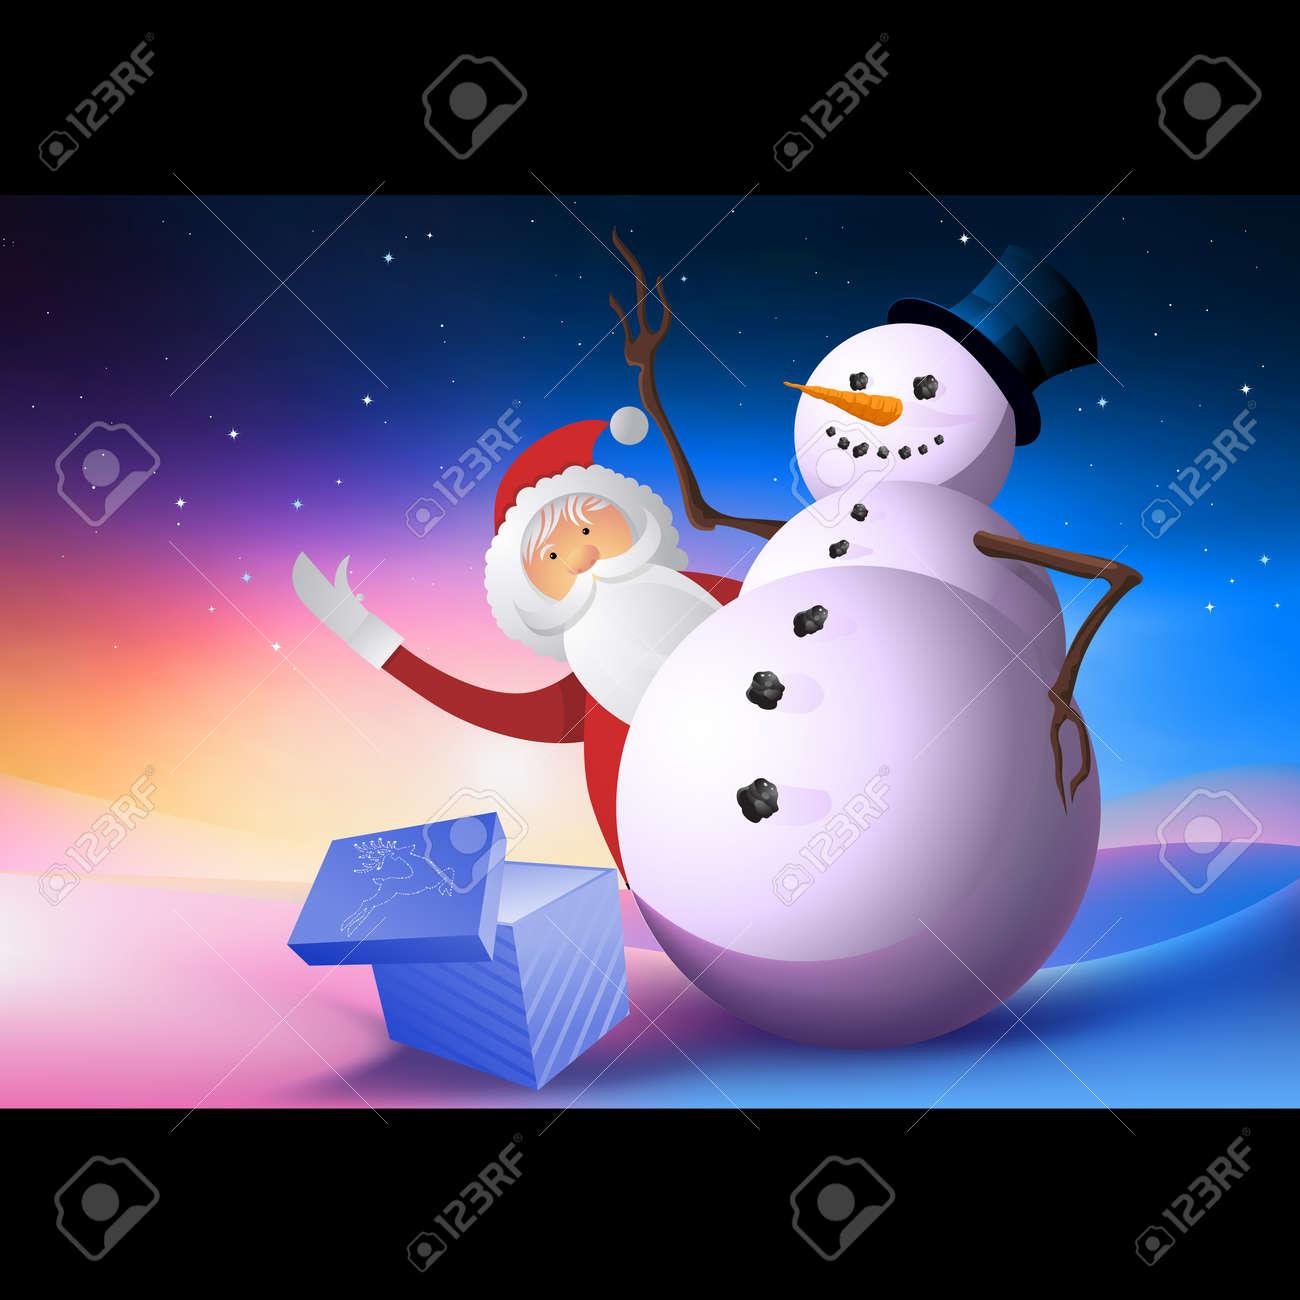 A snowman with Santa waving. Stock Photo - 8266609